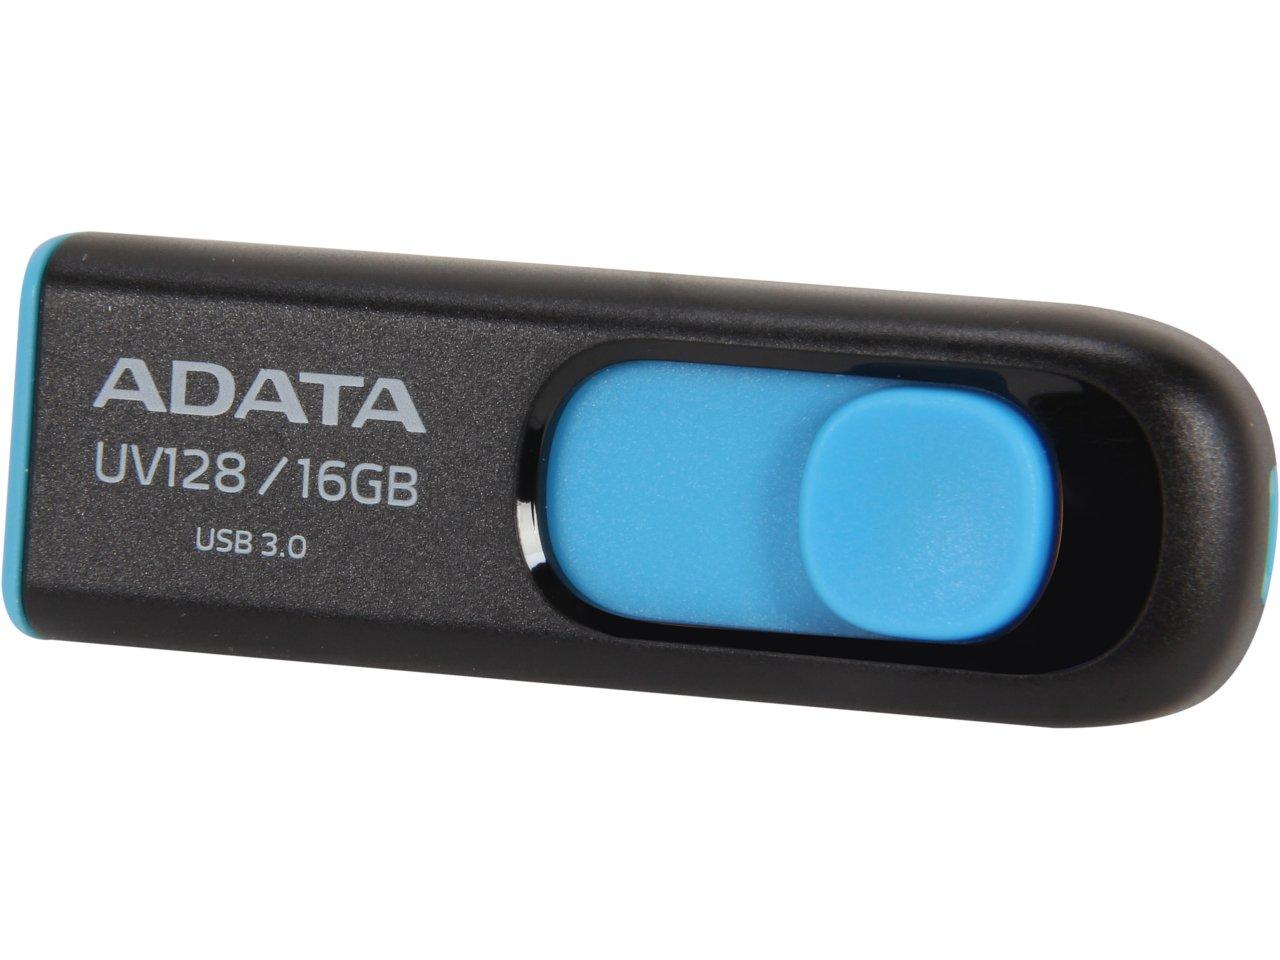 32 GB ADATA Premier Pro Class 10 UHS-1 SDHC Card for $9.99 AC, 64 GB ADATA Premier Pro Class 10 UHS-1 SDHC Card for $19.99 AC & More + Free Shipping @ Newegg.com